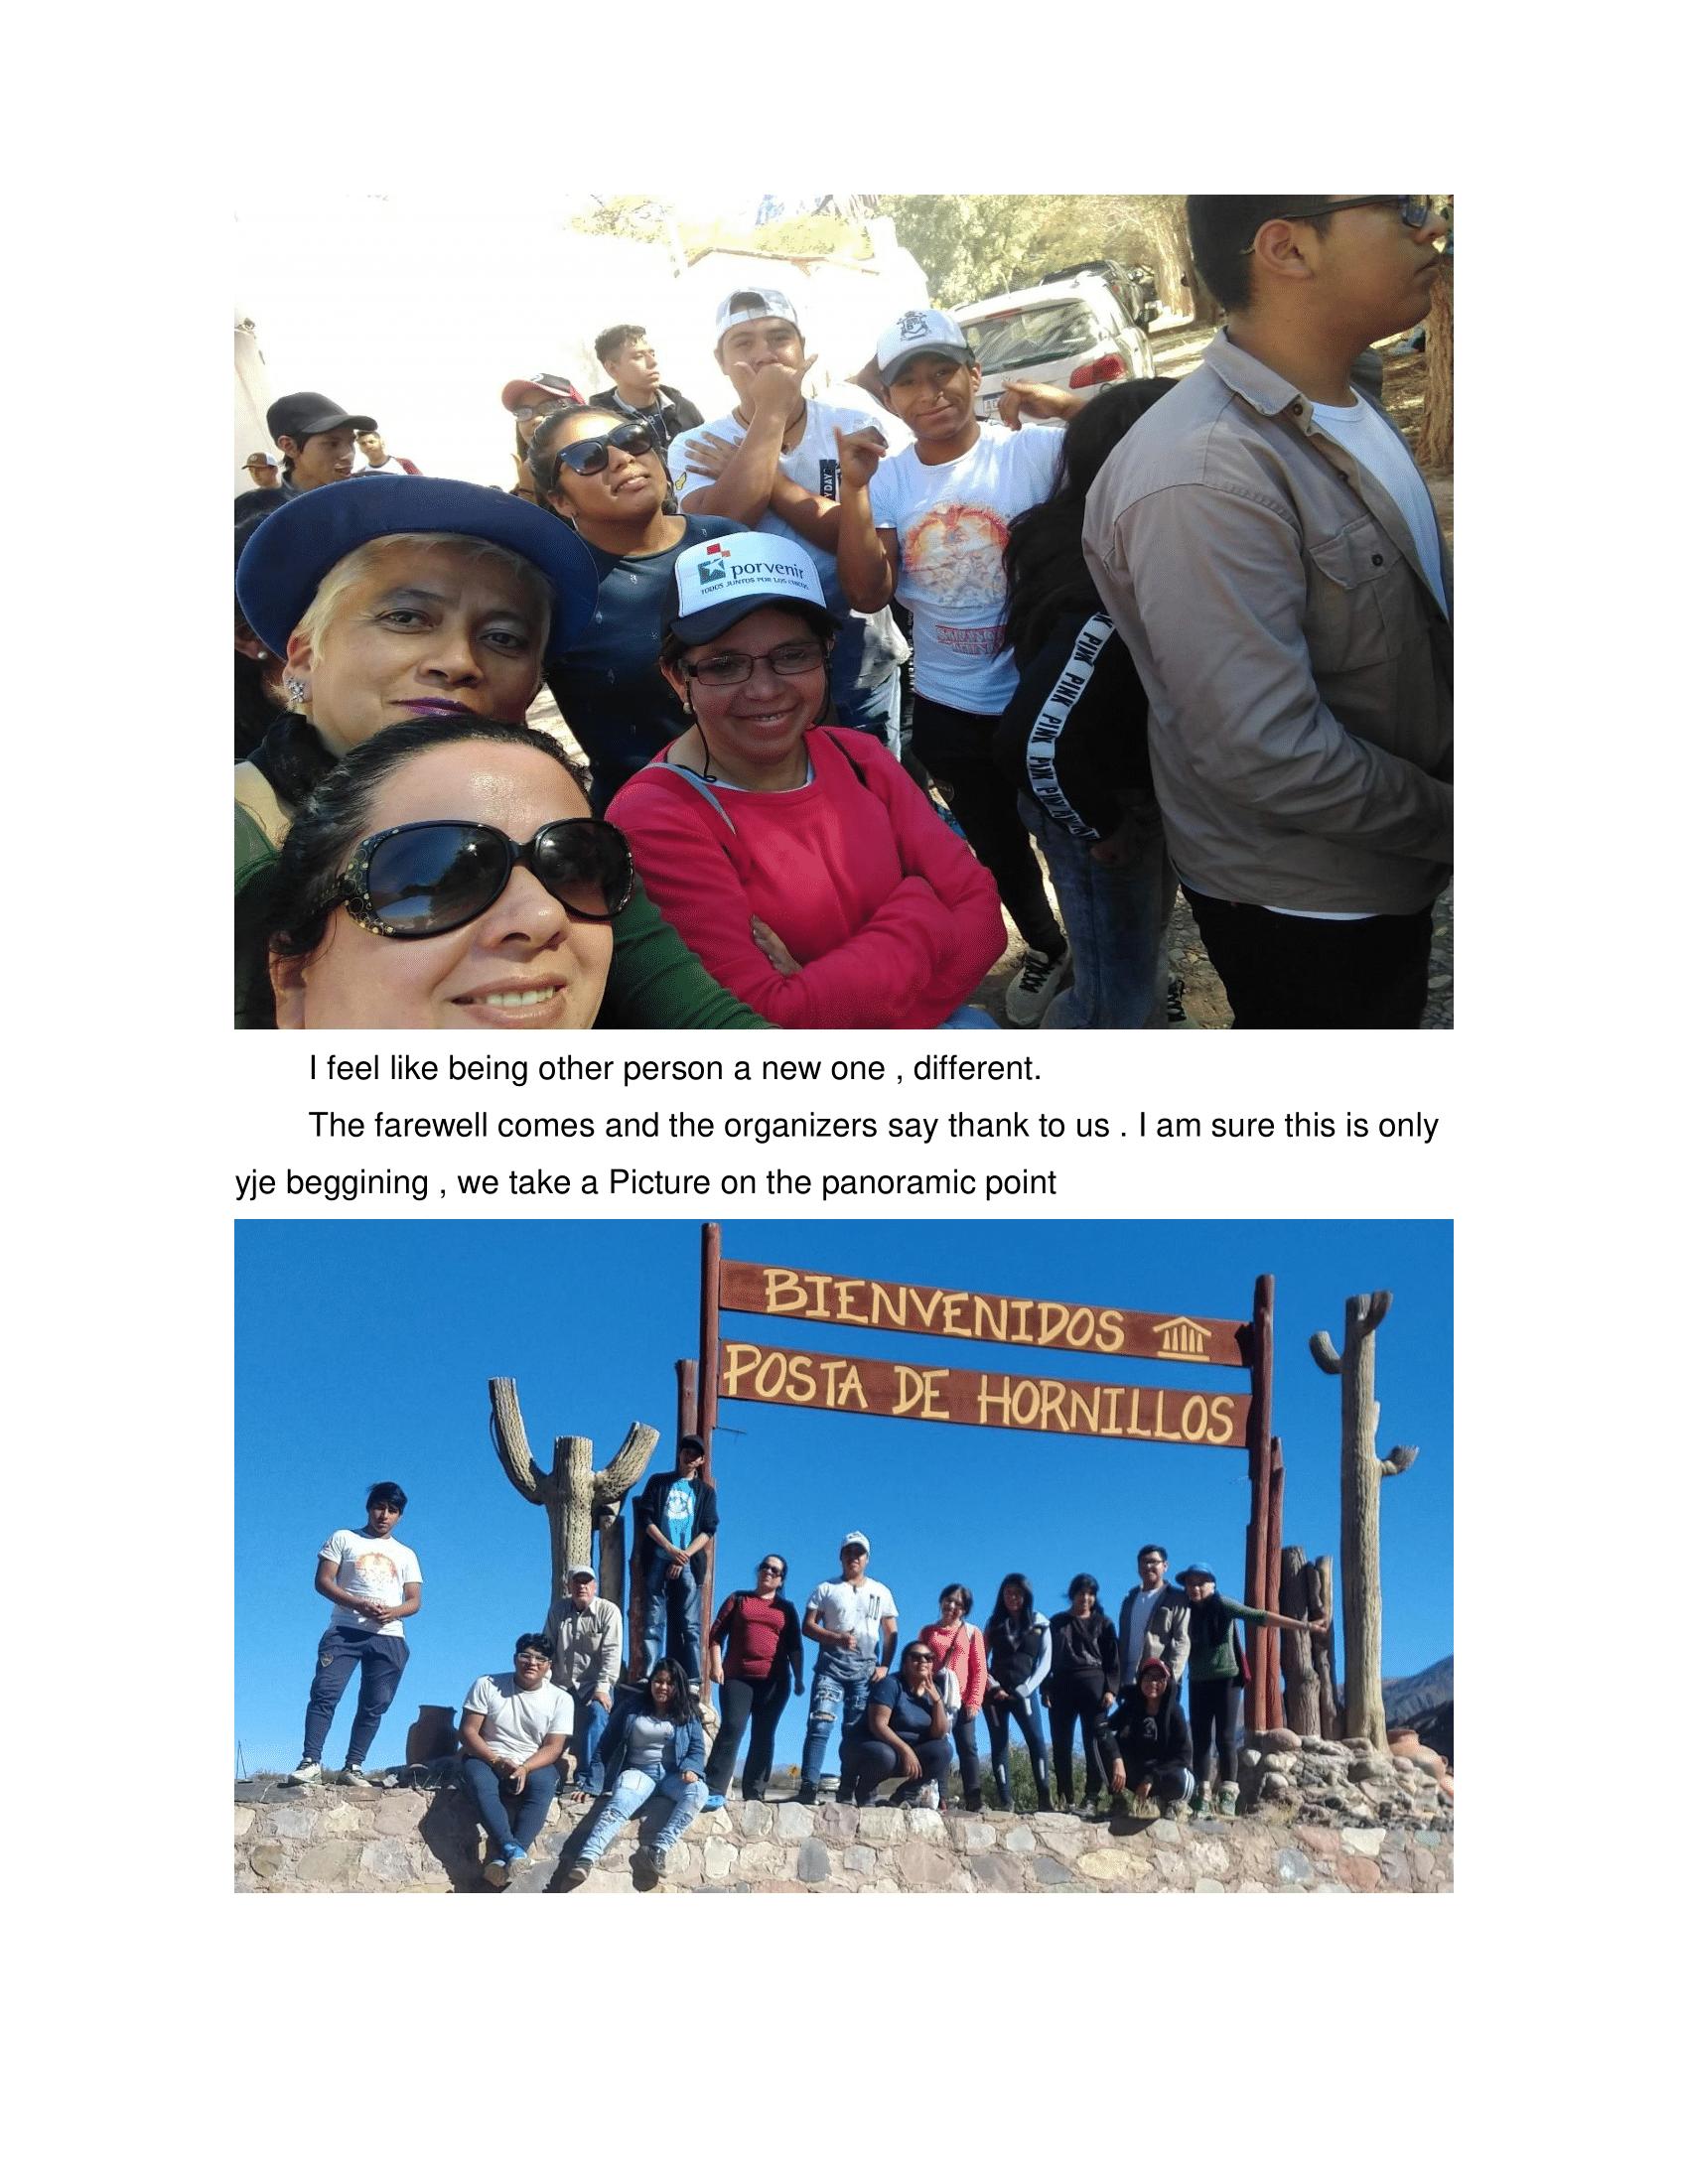 CUENTO-Lucinda-Acosta - Luci Del Valle-12.png